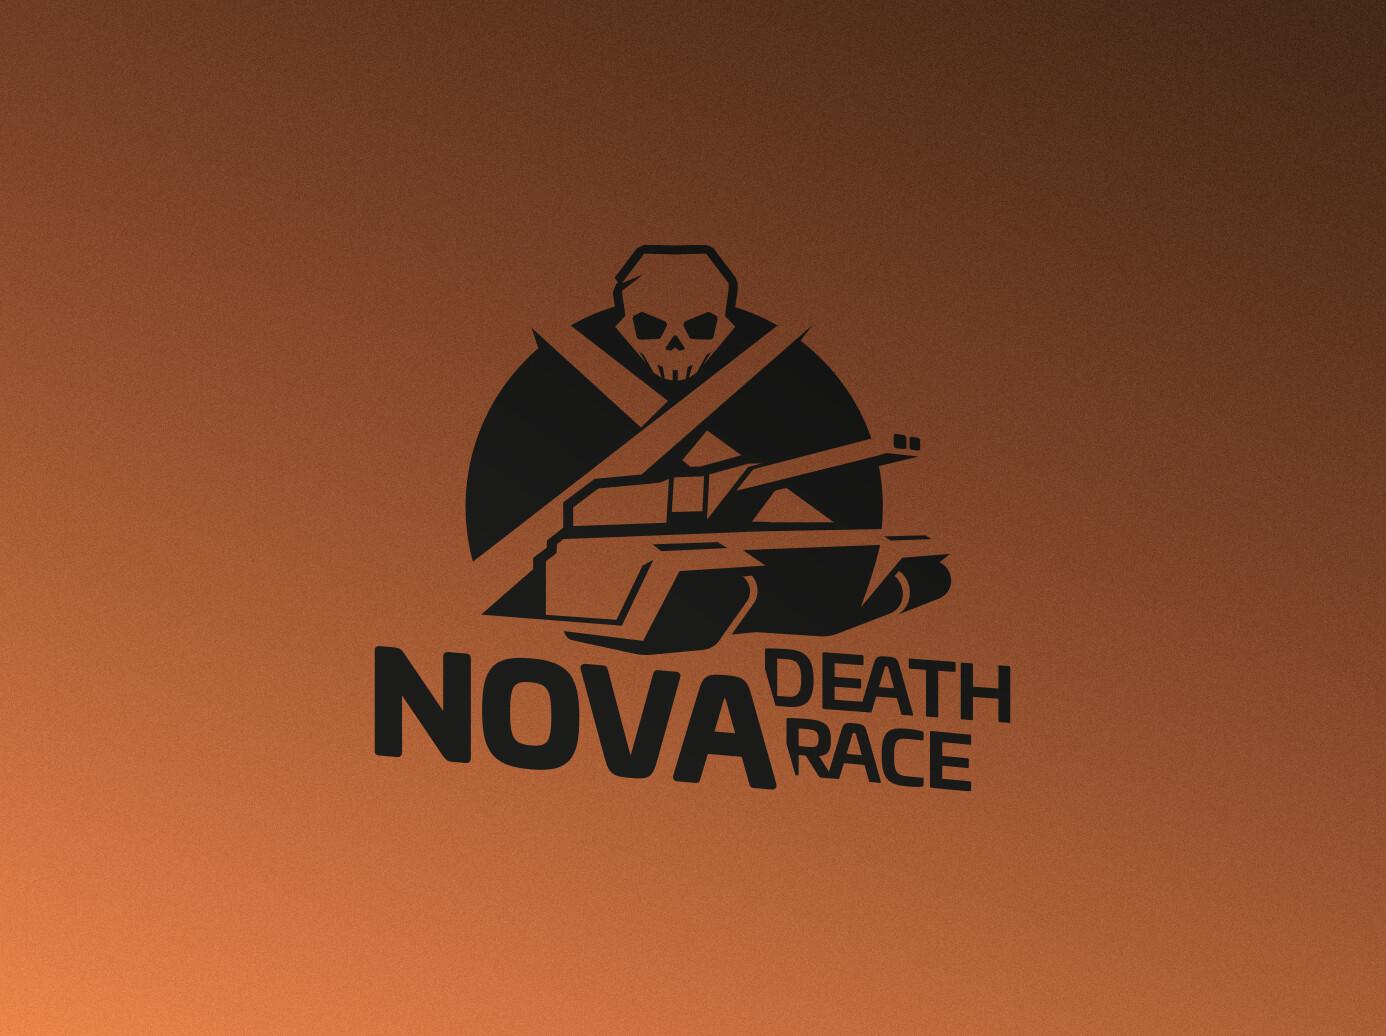 NOVA Death Race